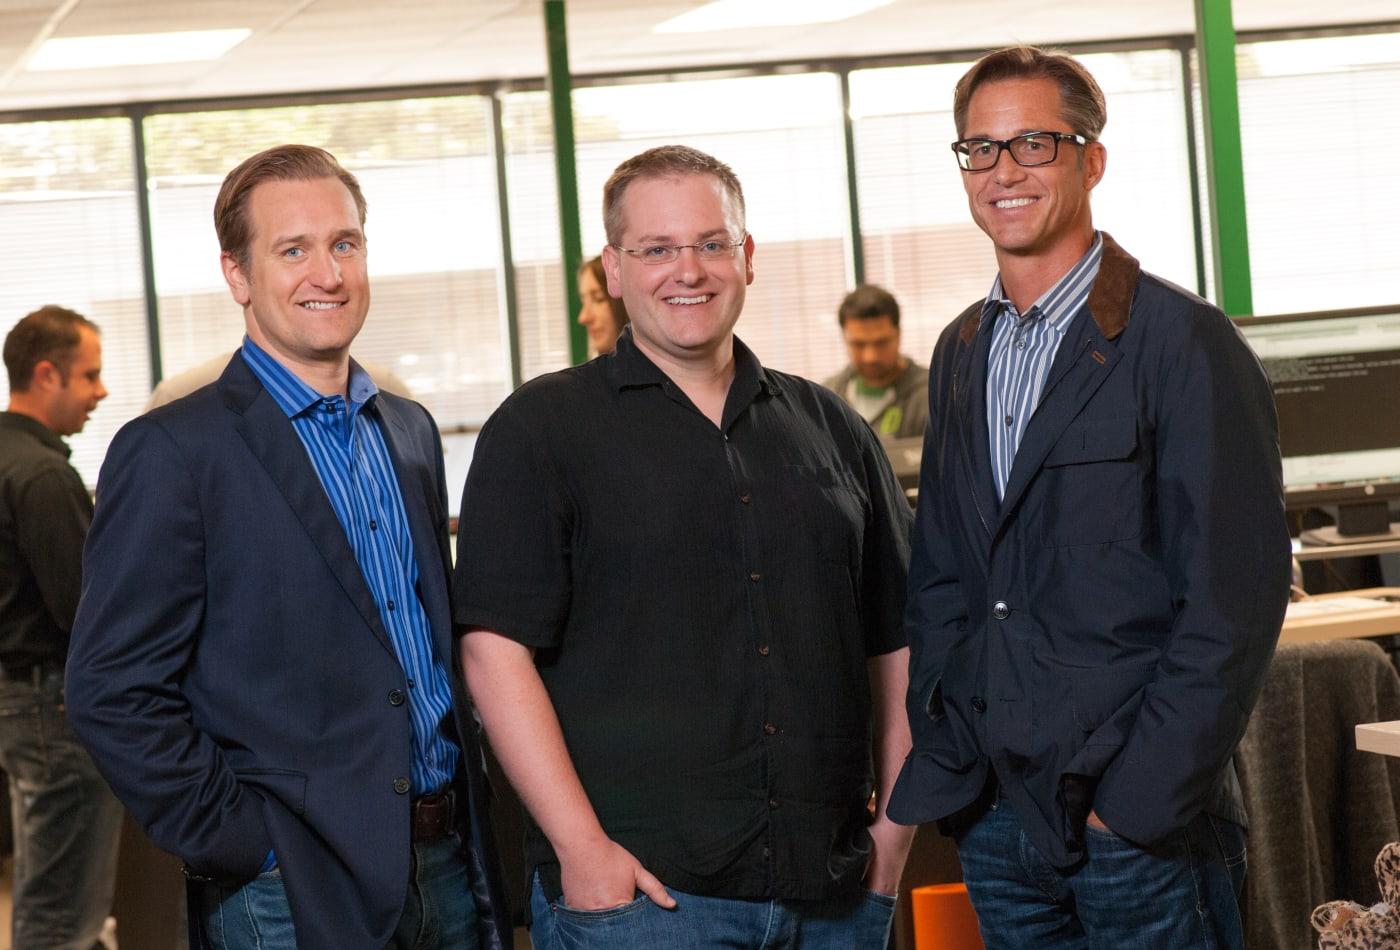 Glassdoor CEO and founders